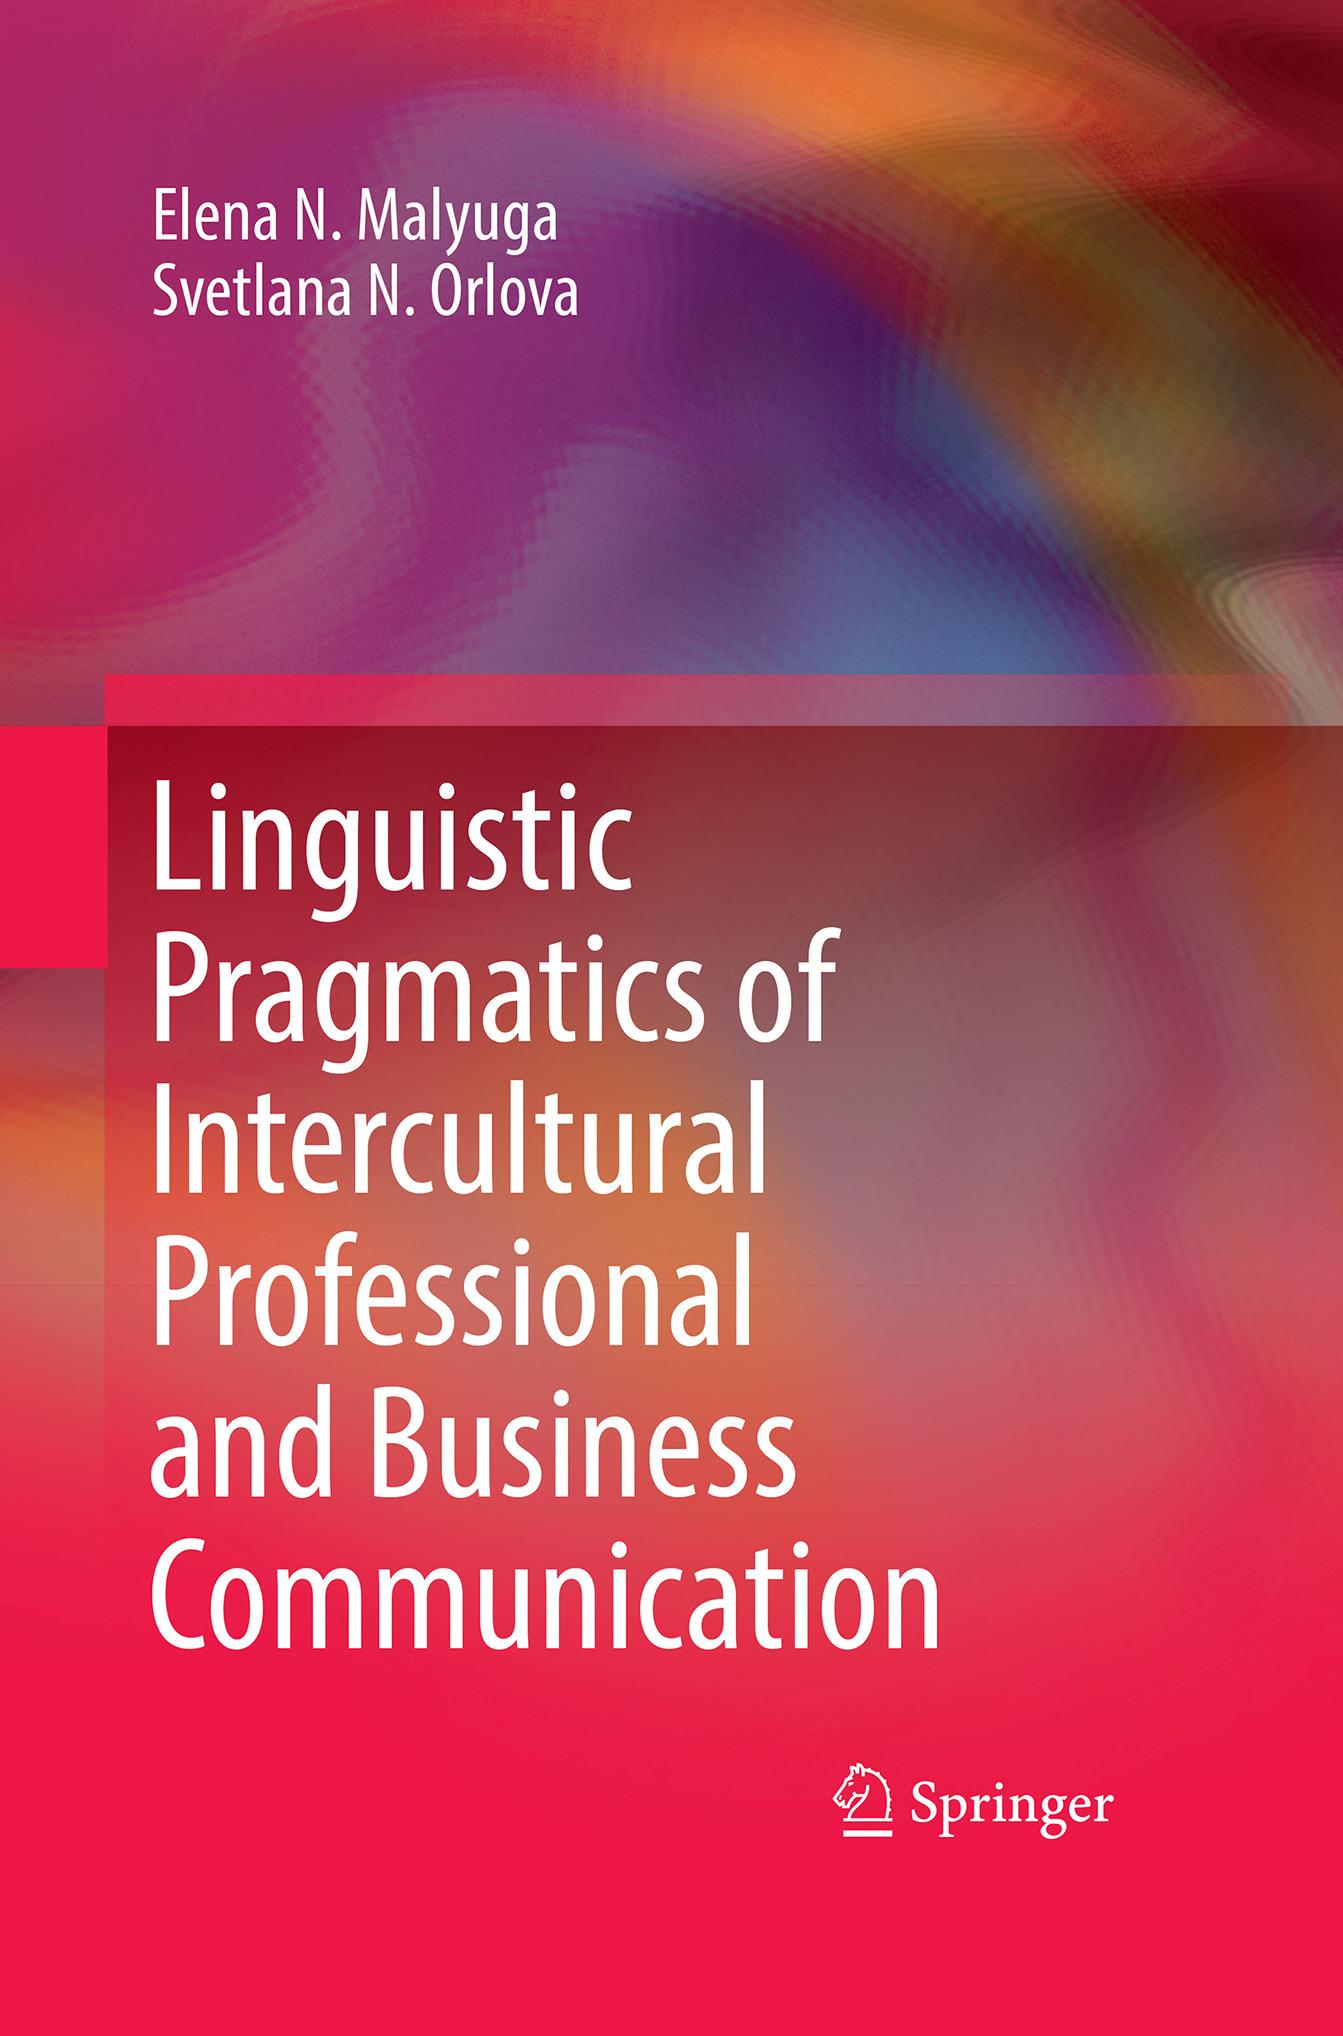 Malyuga, Elena N. - Linguistic Pragmatics of Intercultural Professional and Business Communication, ebook